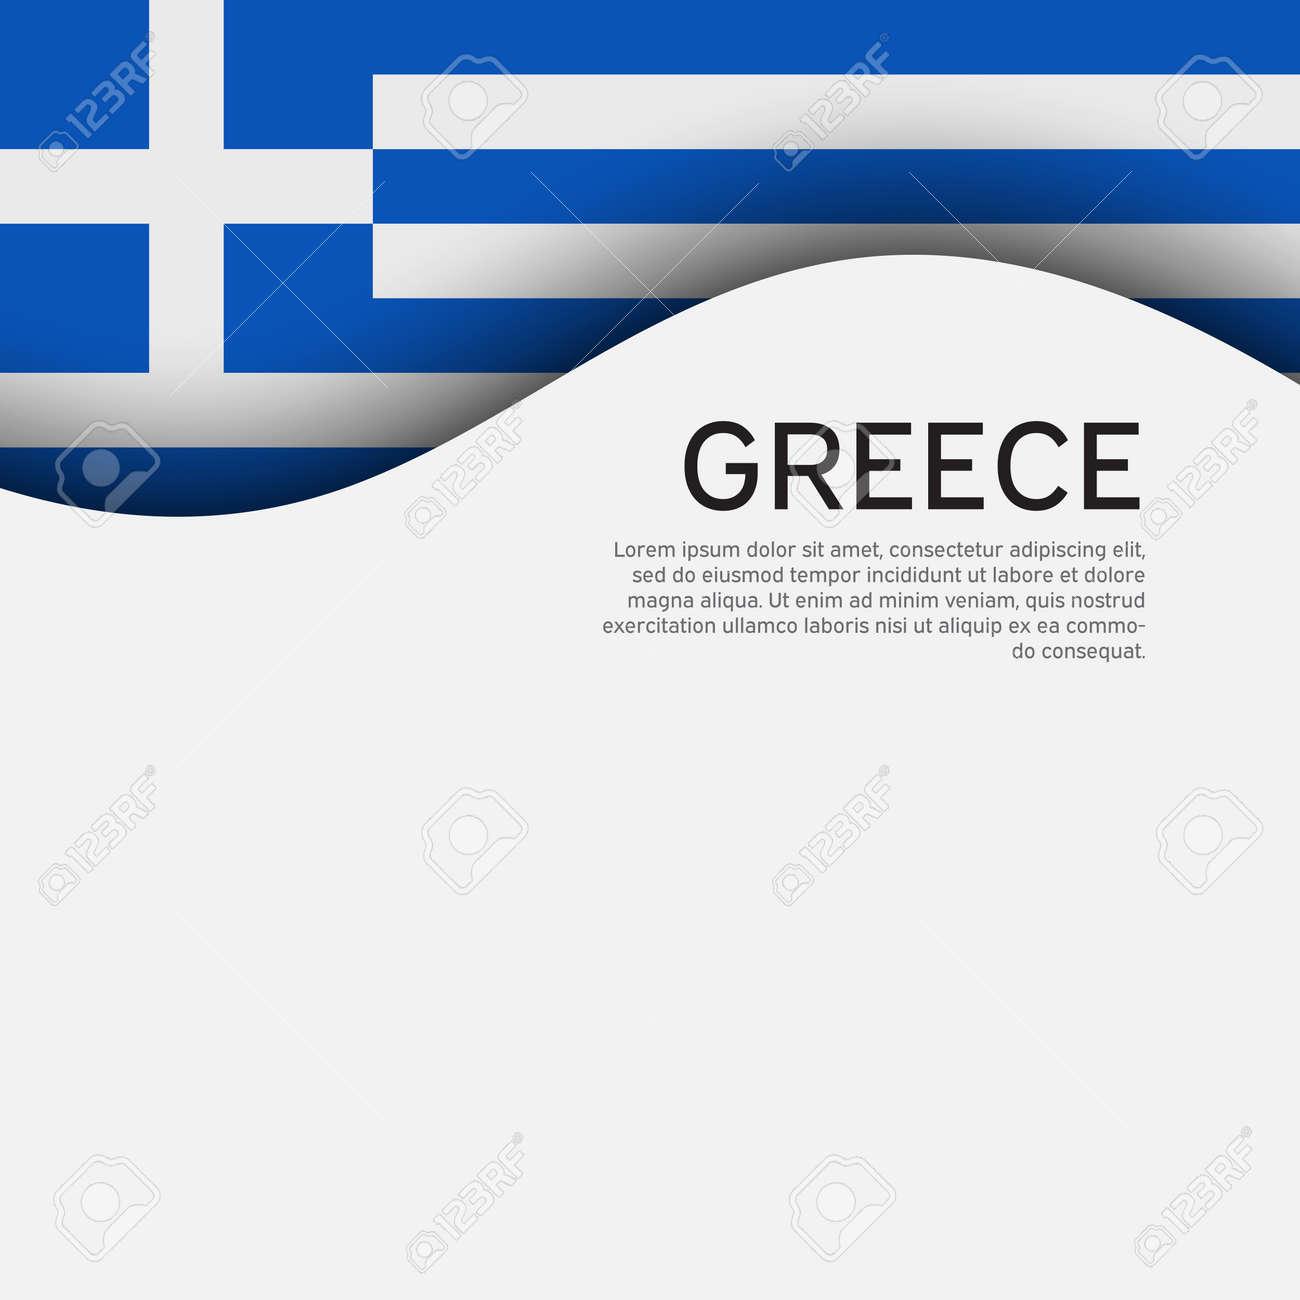 Background with flag of greece. Greece flag on a white background. State greek patriotic banner, flyer. National poster design. Business booklet. Wave pattern. Vector illustration - 170188438